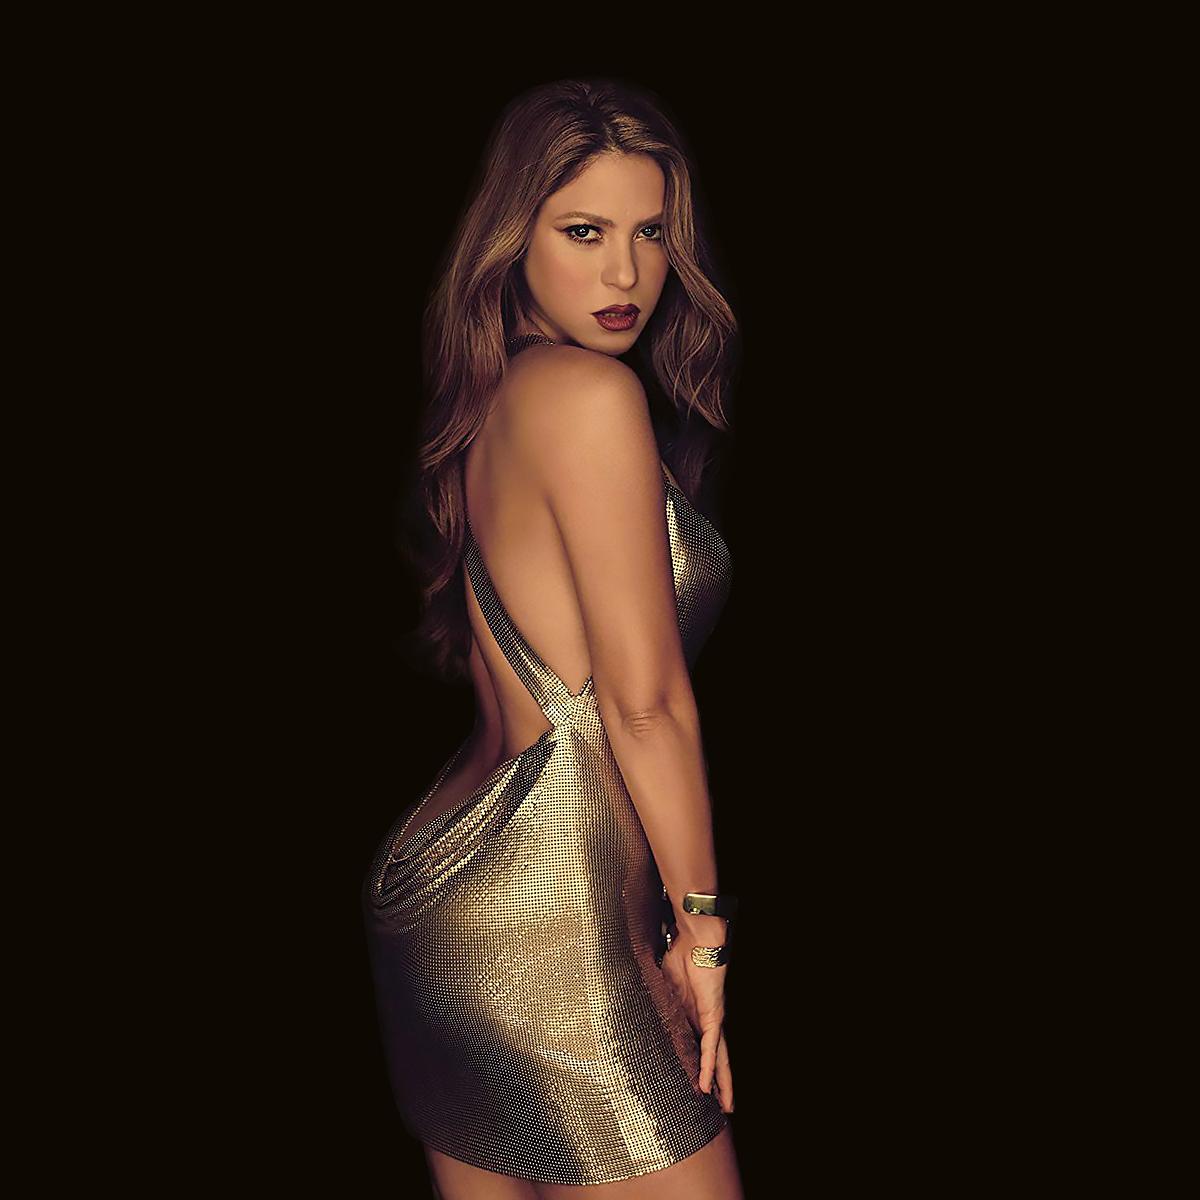 Shakira >> preparando nuevo álbum - Página 8 EcmaPxIXkAASa8w?format=png&name=medium